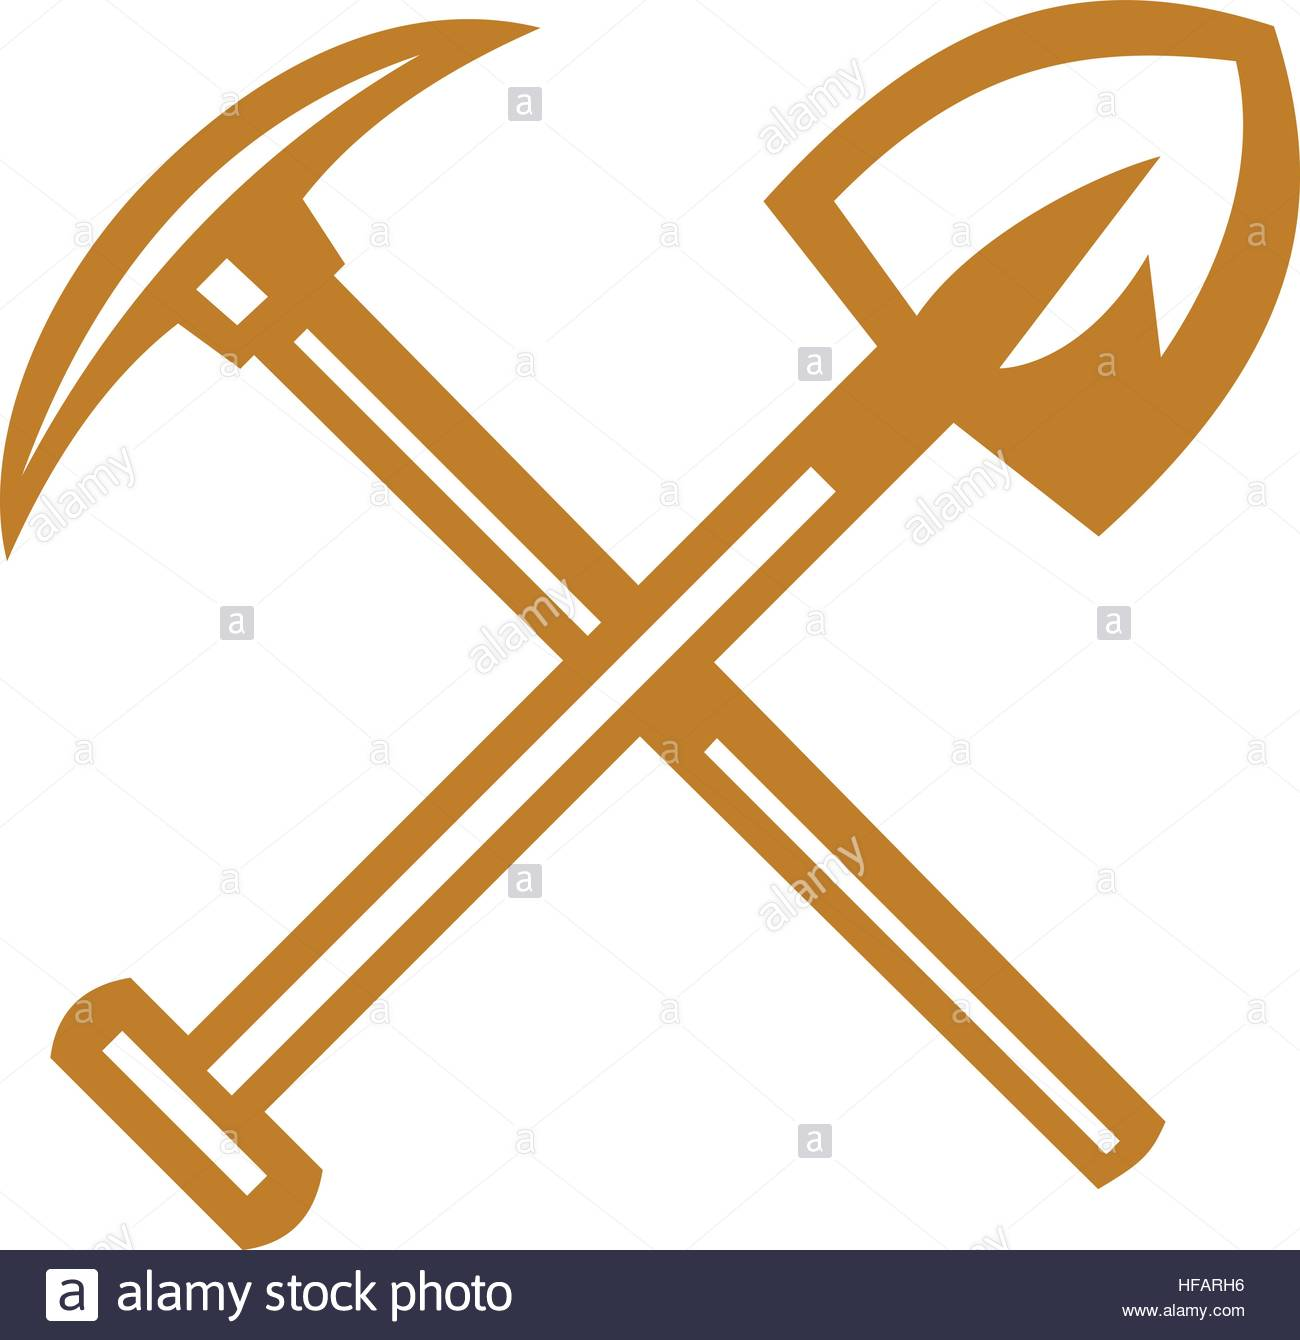 Shovel Clipart